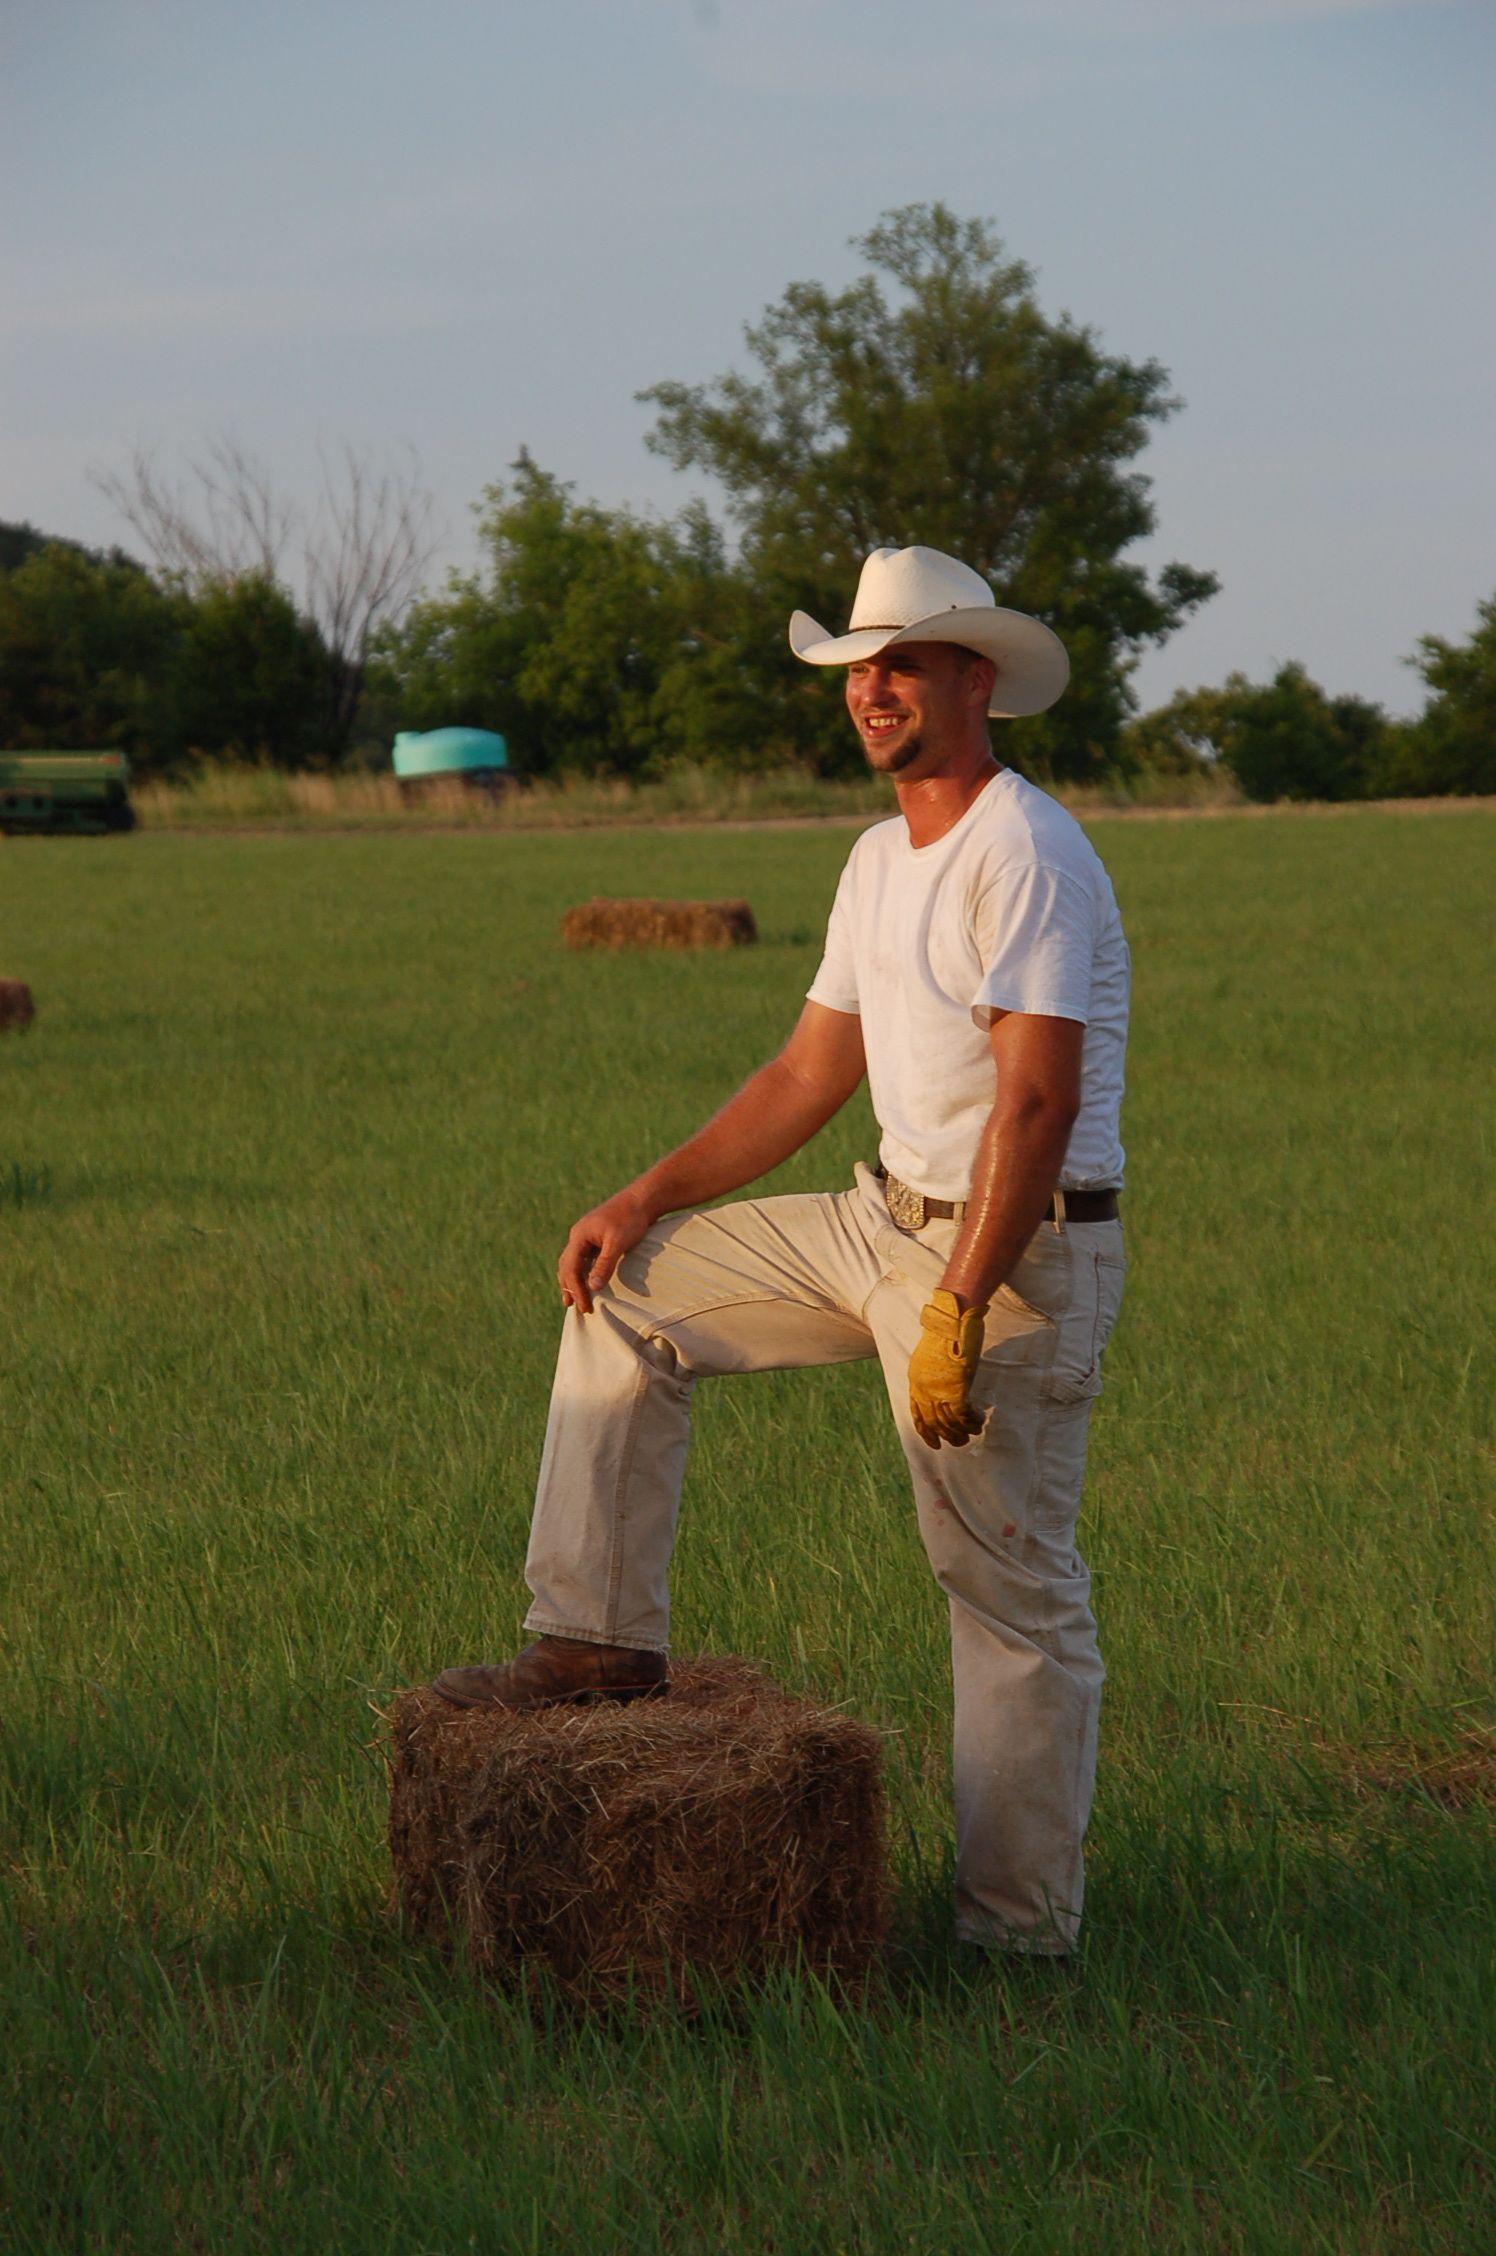 Visions of Cody: Kontemplation auf dem Feld